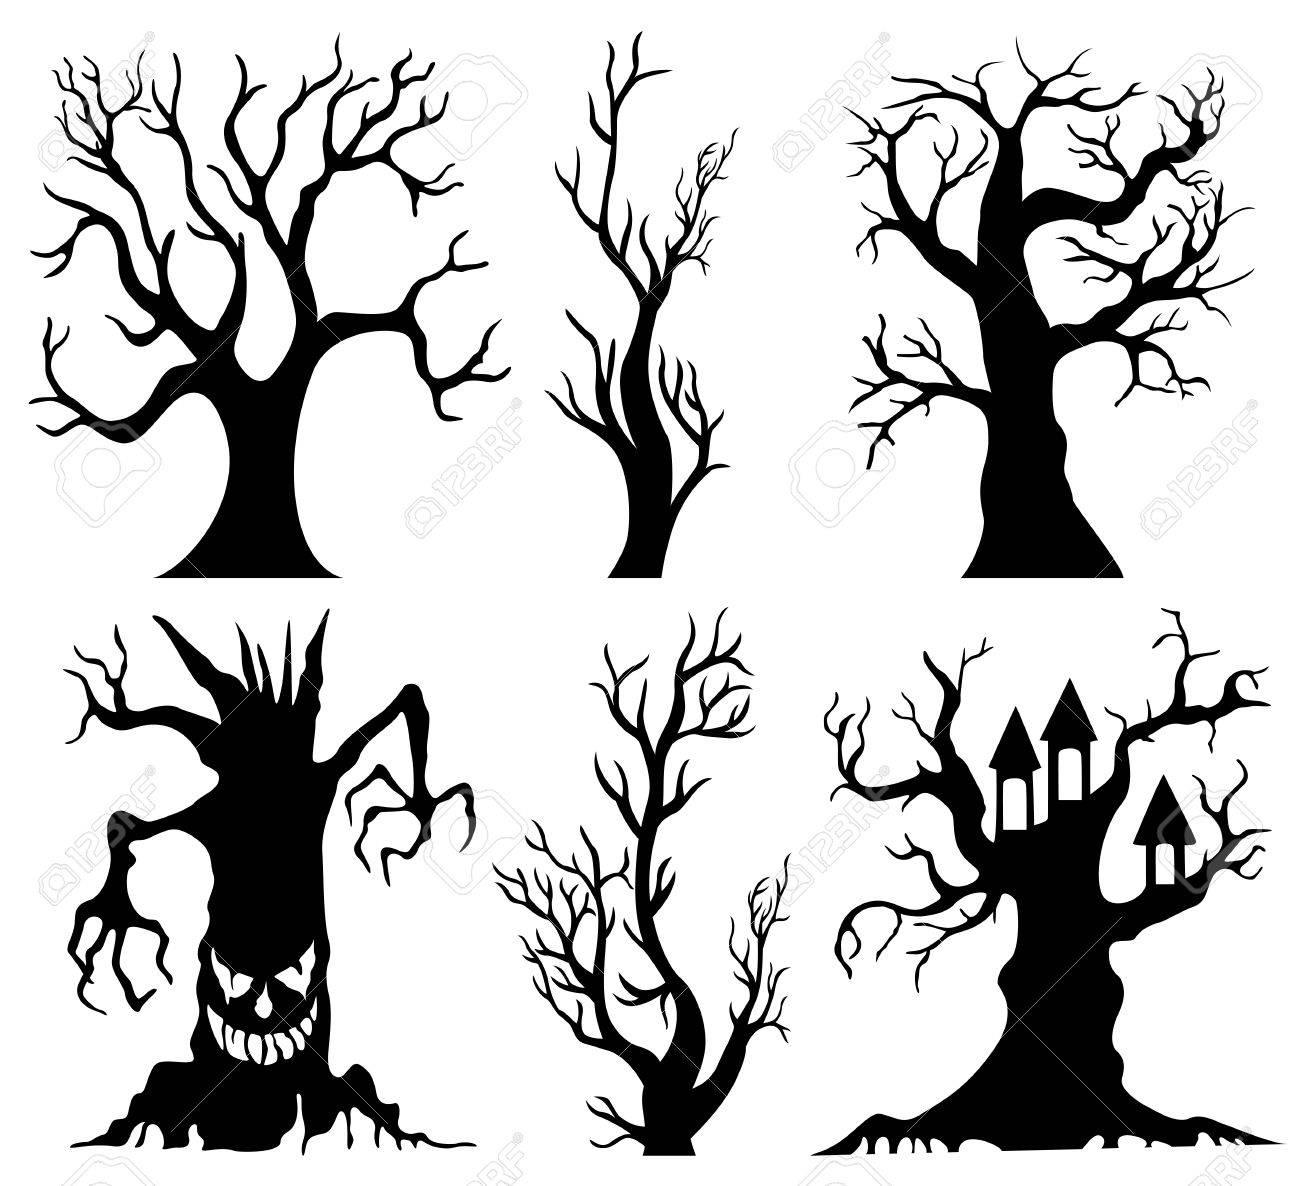 1300x1186 Set Of Spooky Halloween Tree Cartoon Stock Photo, Picture